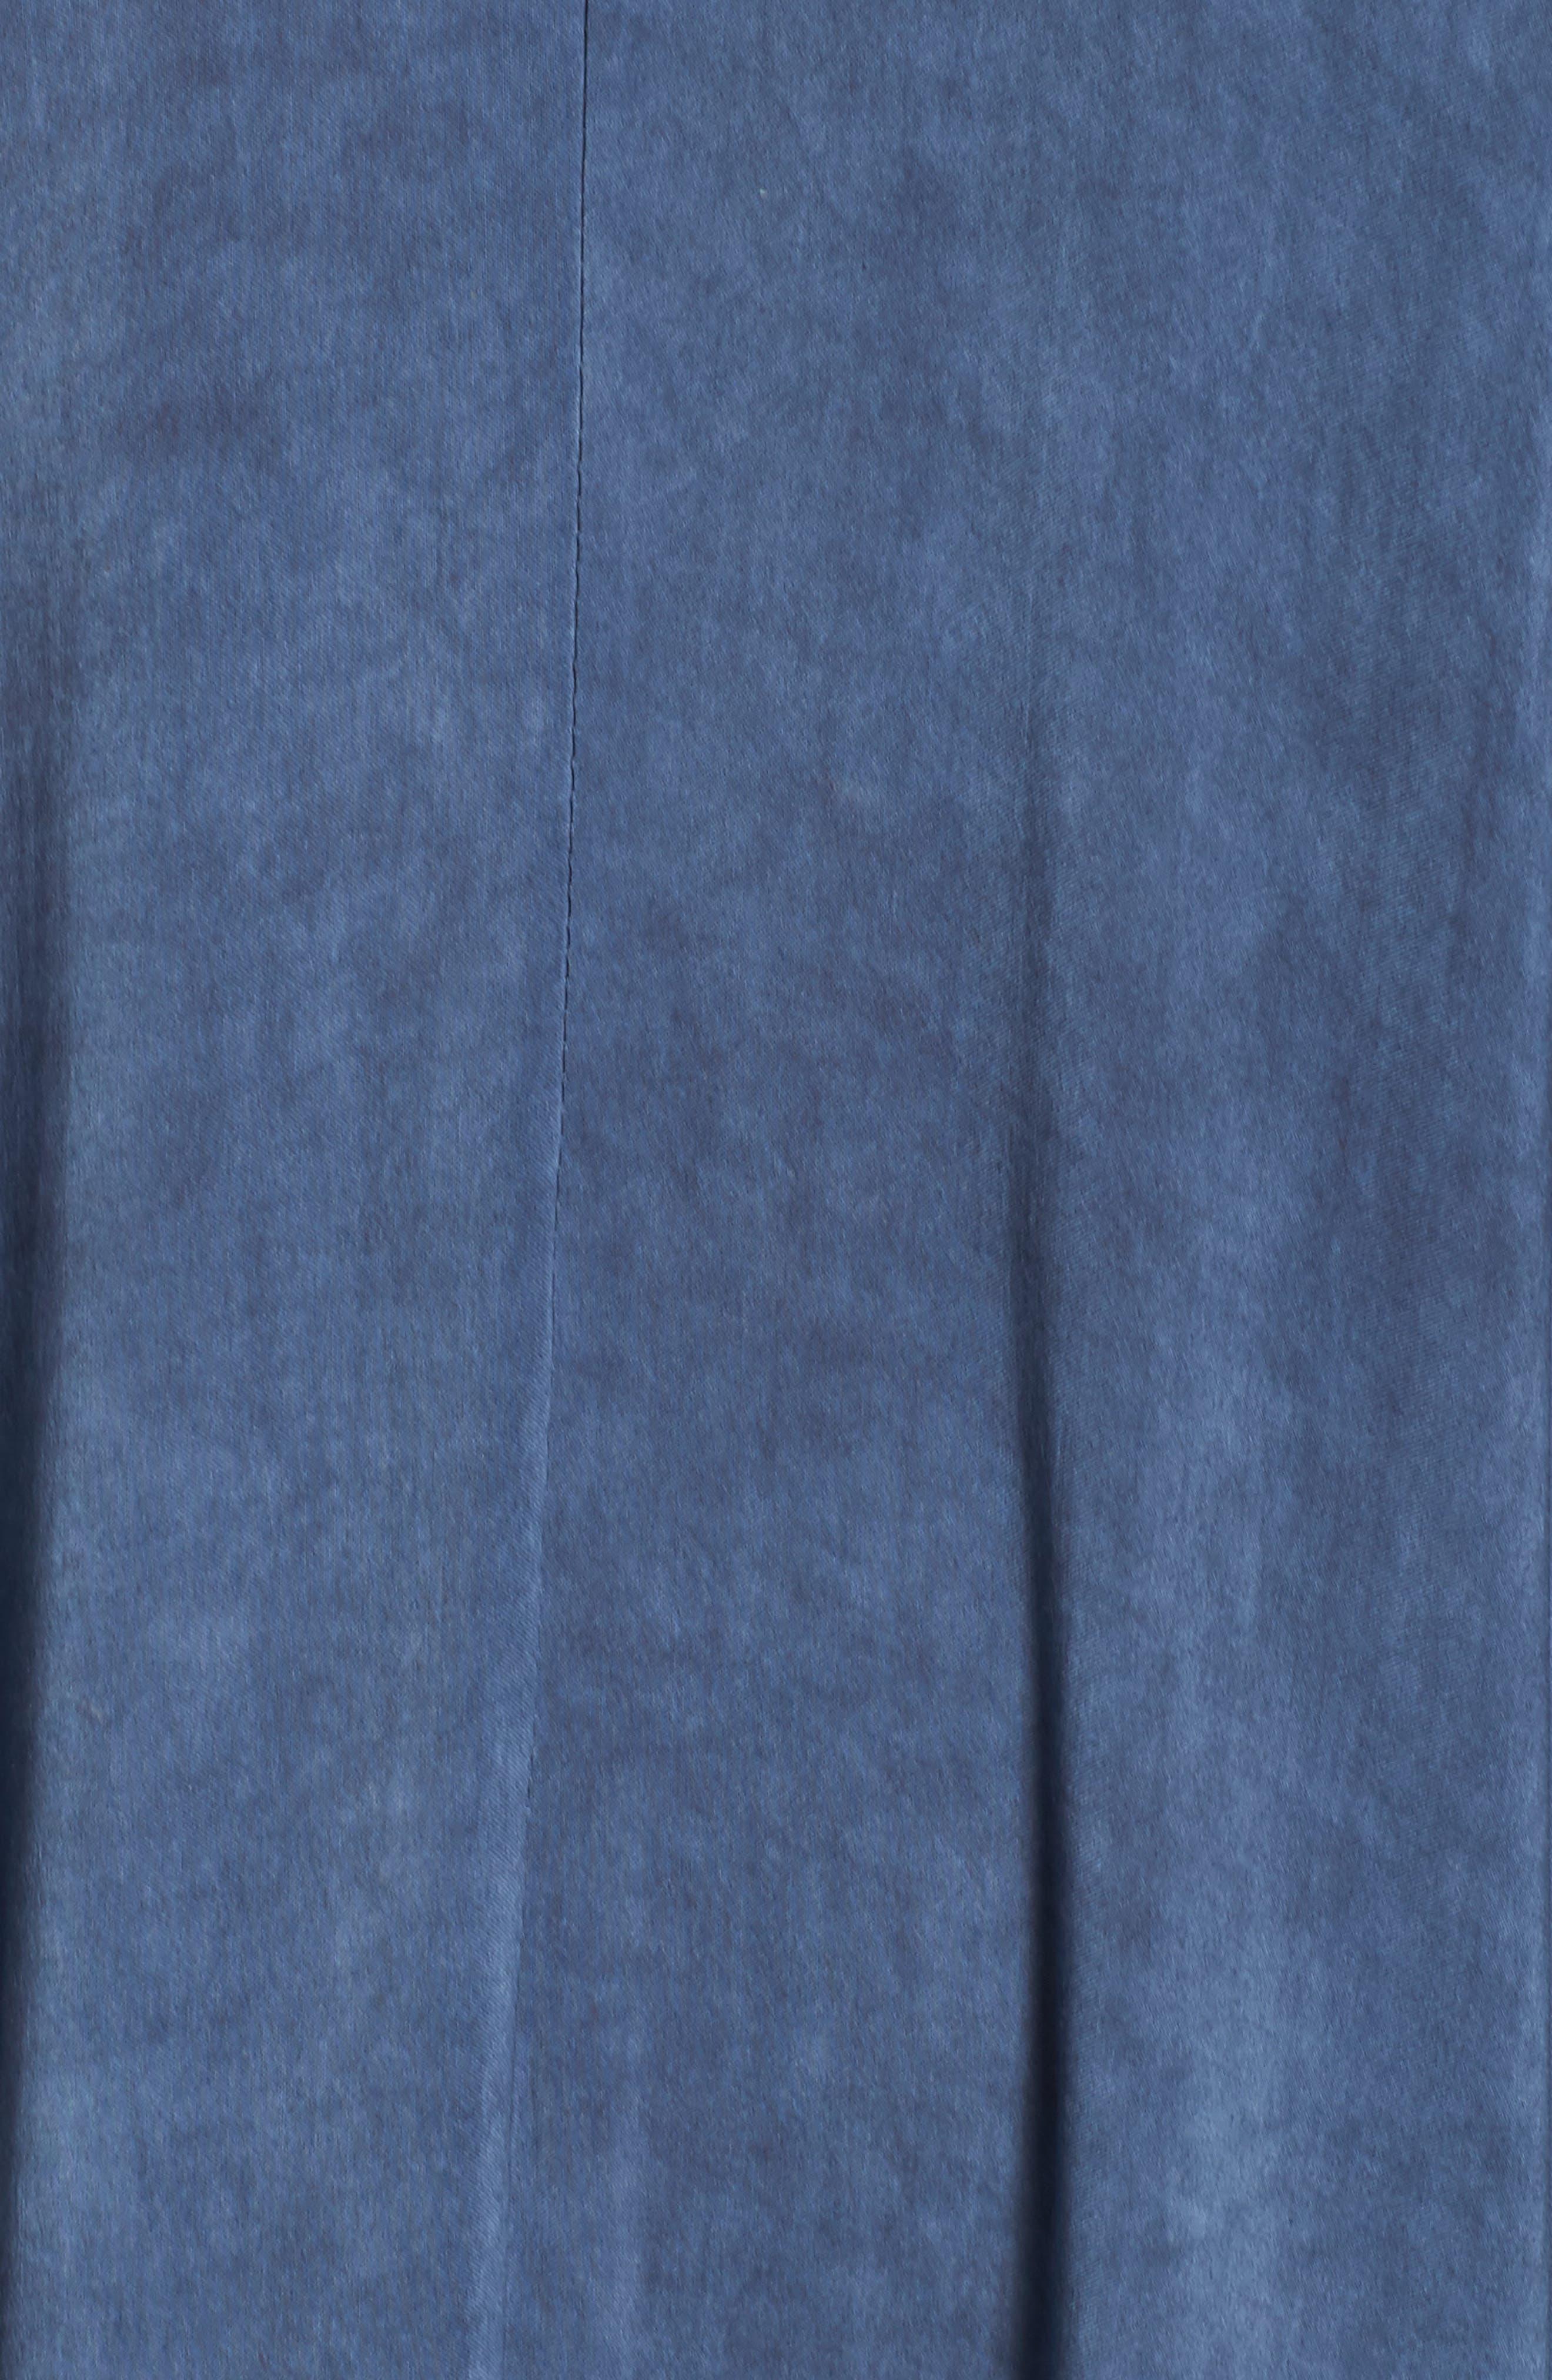 Cover-Up Maxi Dress,                             Alternate thumbnail 29, color,